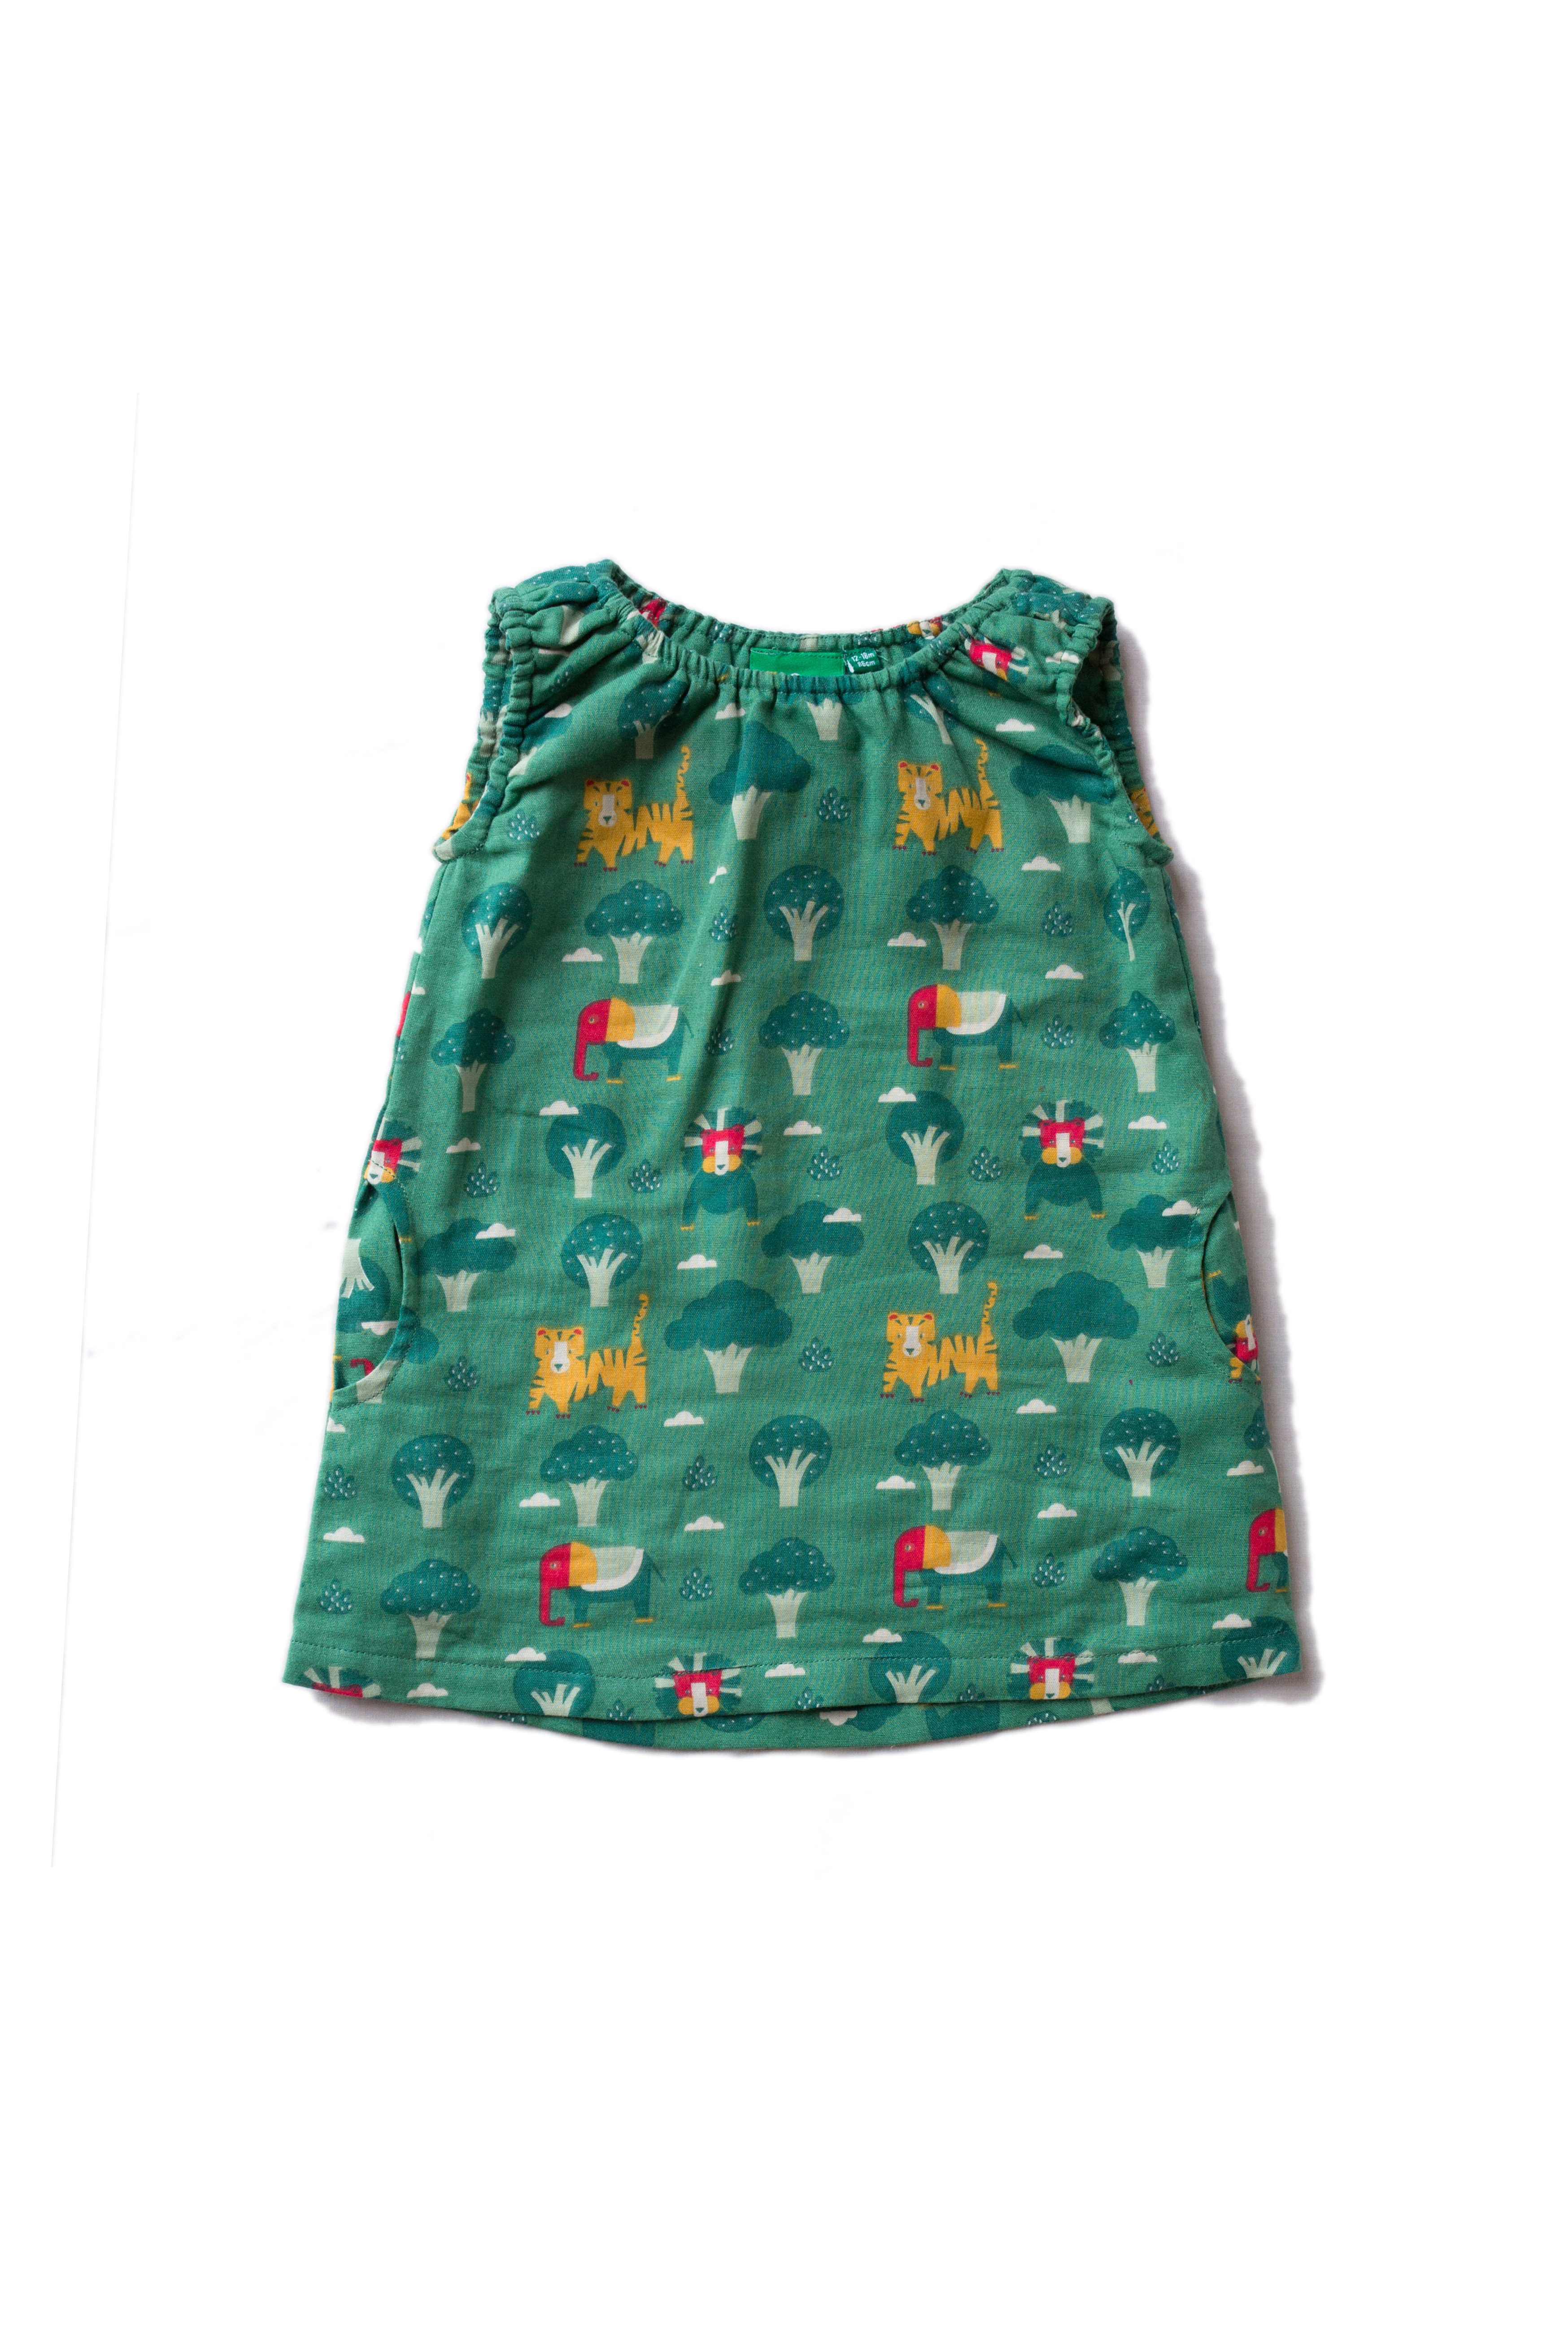 Little Green Radicals - jungle adventures twirl dress